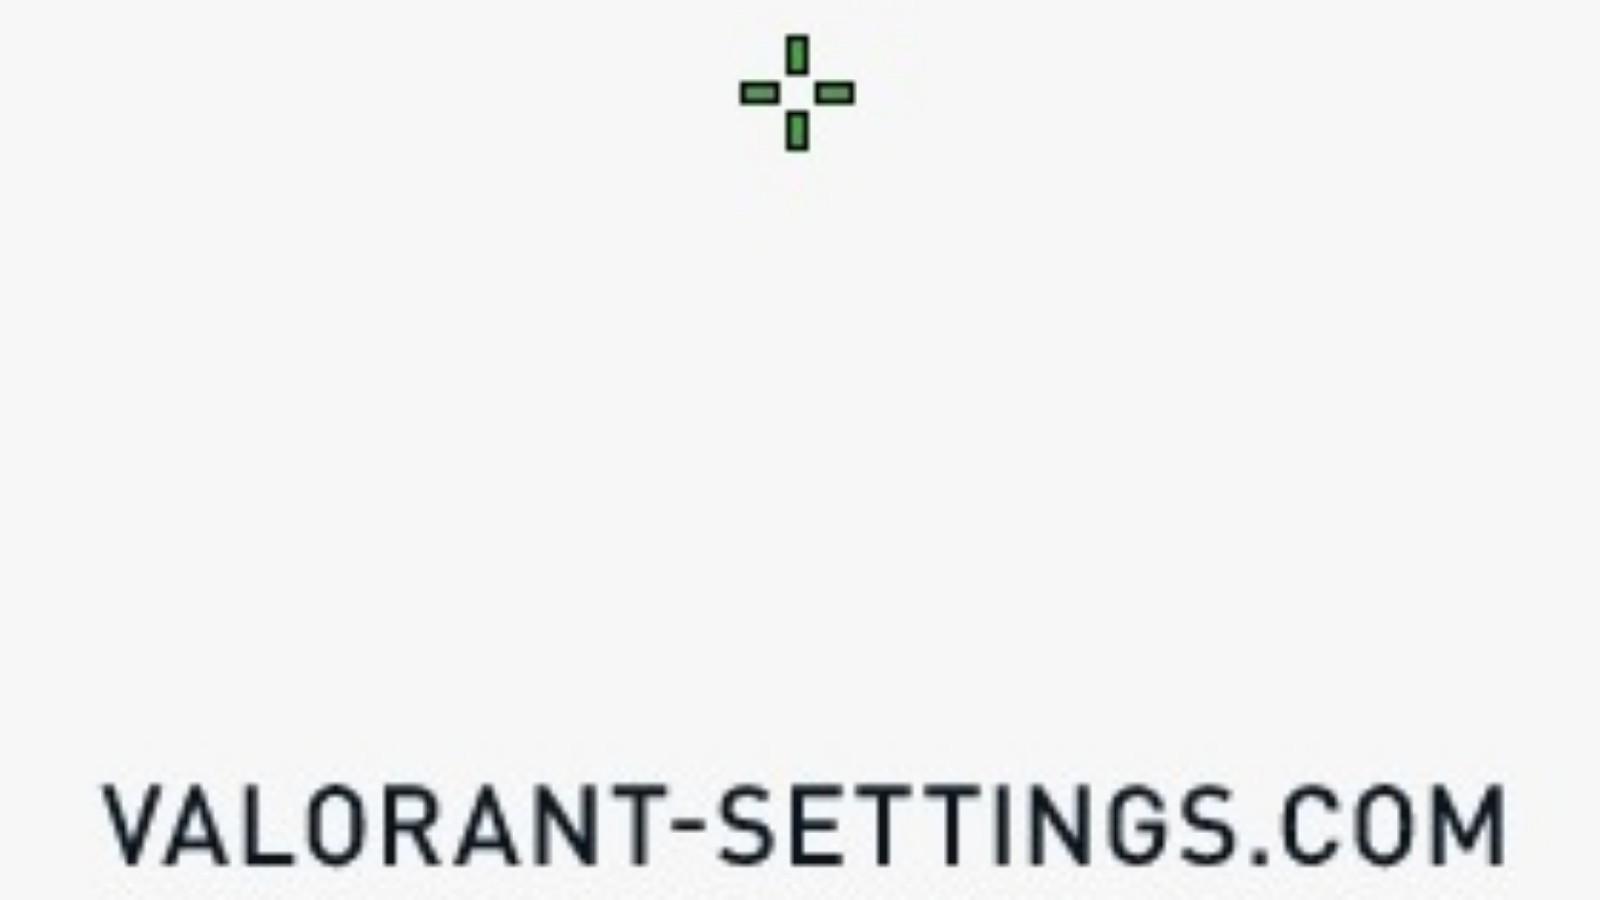 Valorant Pro Crosshairs Settings